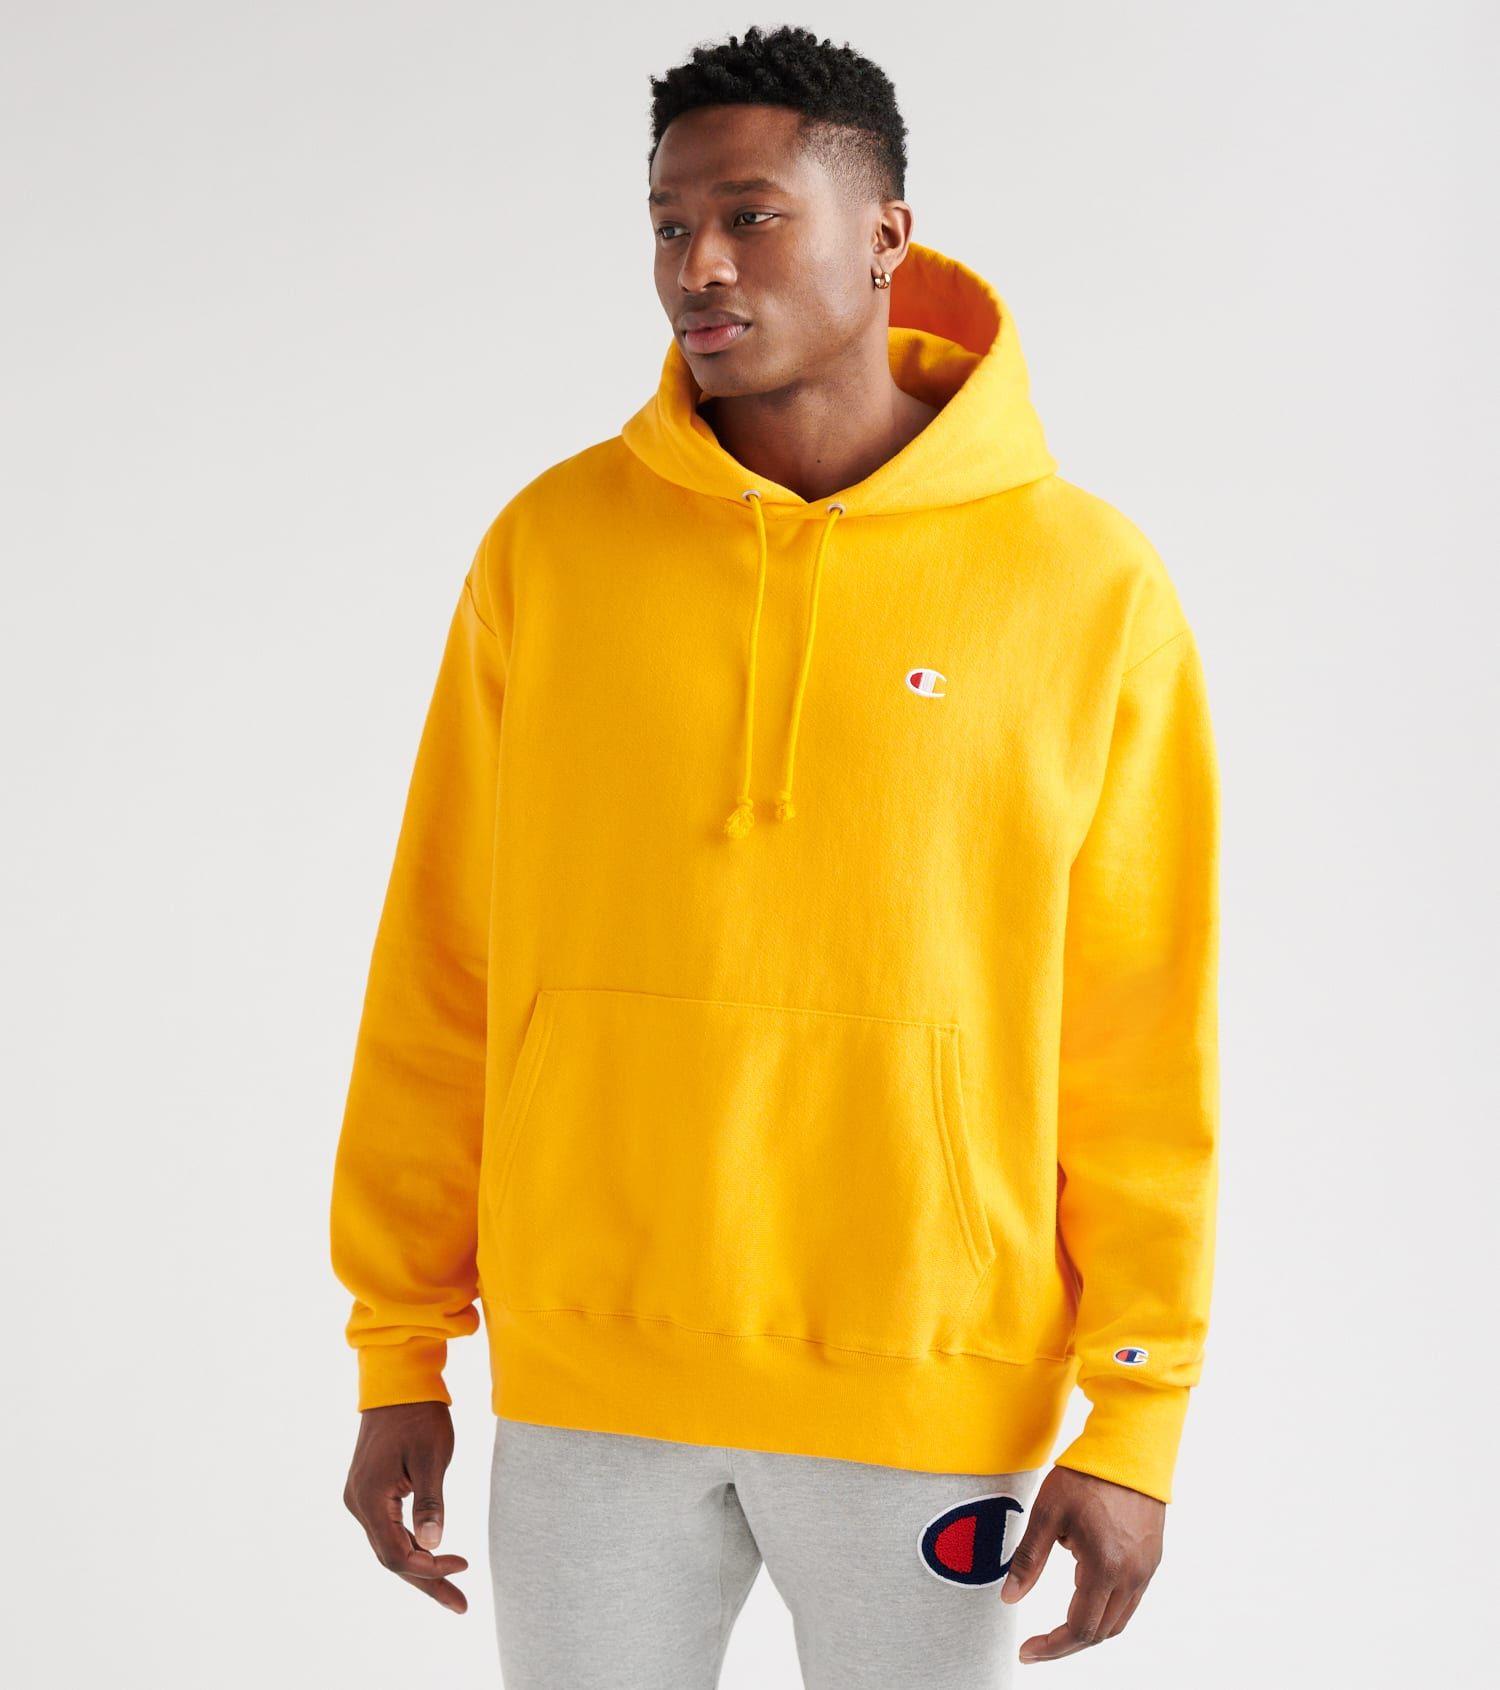 Vintage Mustard Nike Sweatshirt Ragstock Vintage Nike Sweatshirt Vintage Sweatshirt Clothes [ 1200 x 800 Pixel ]